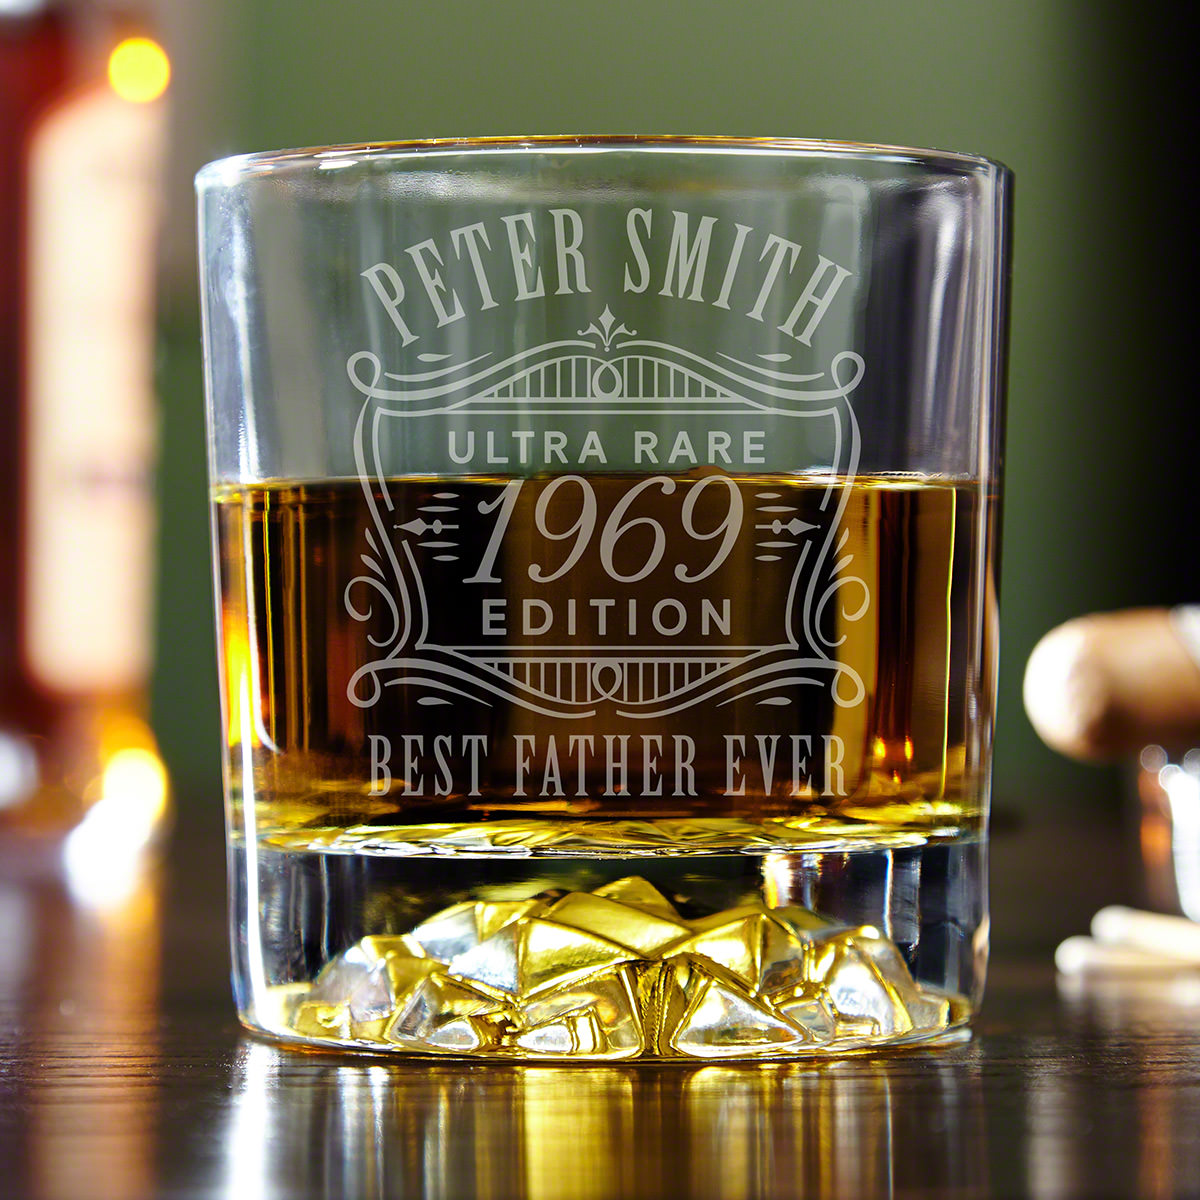 Ultra Rare Edition Custom Fairbanks Whiskey Glass